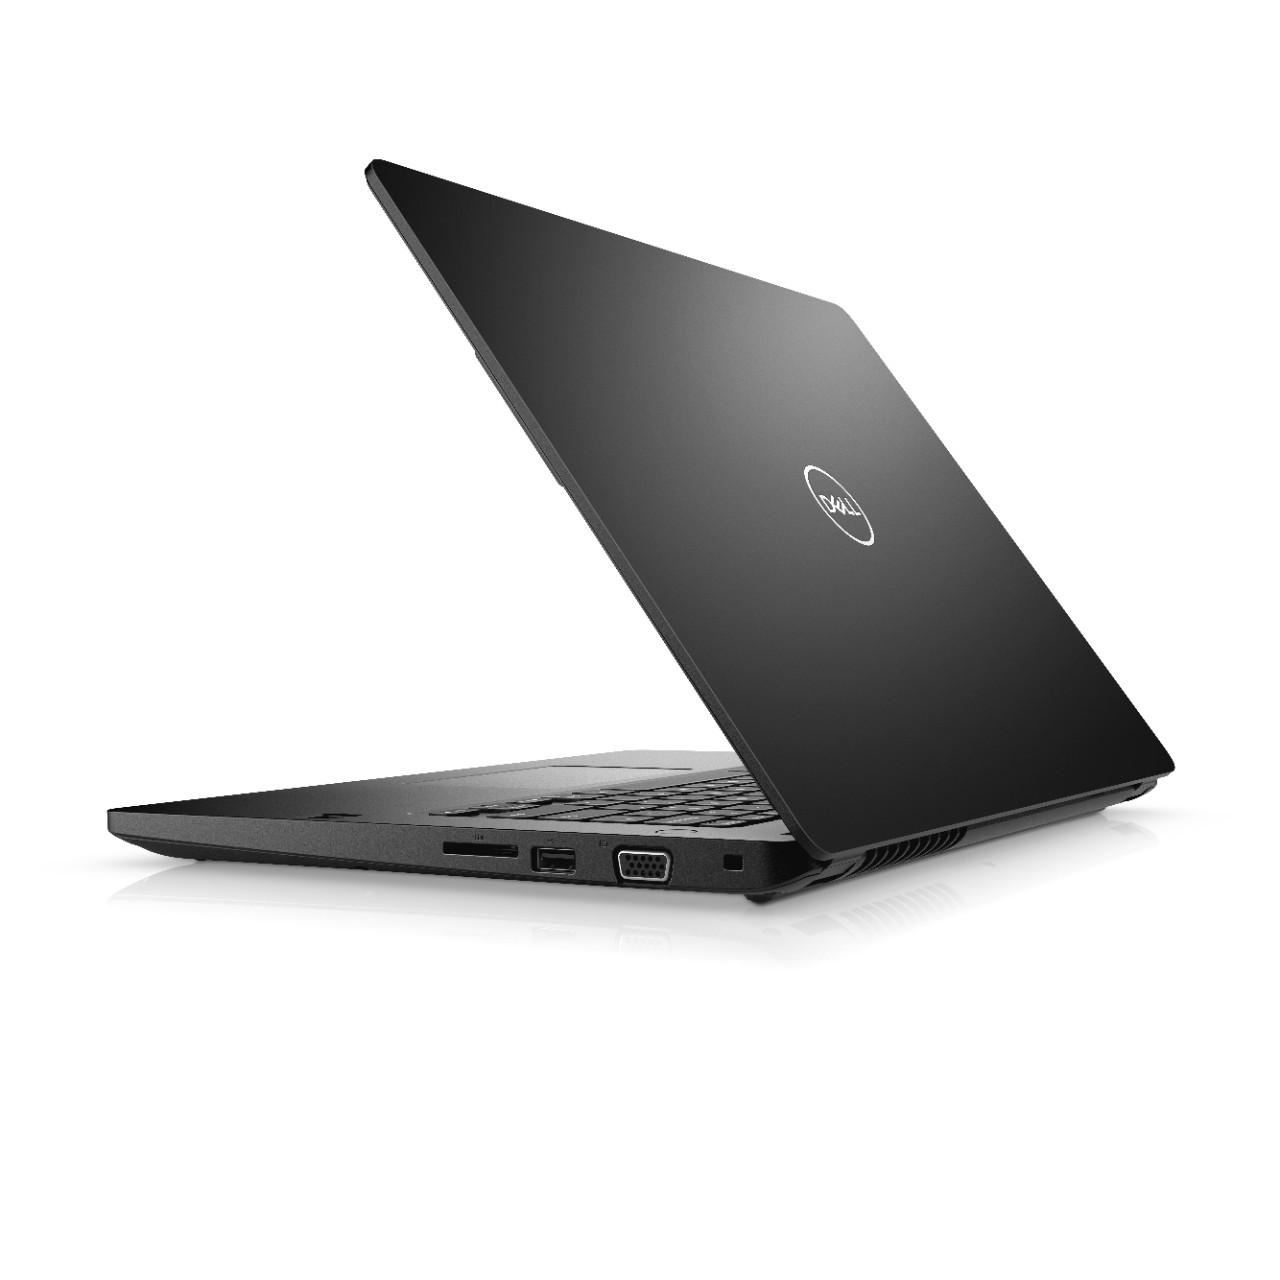 "Dell Latitude 3480 14"" HD i3-7100U/4GB/500GB/MCR/VGA/HDMI/W10P/3RNBD/Černý"